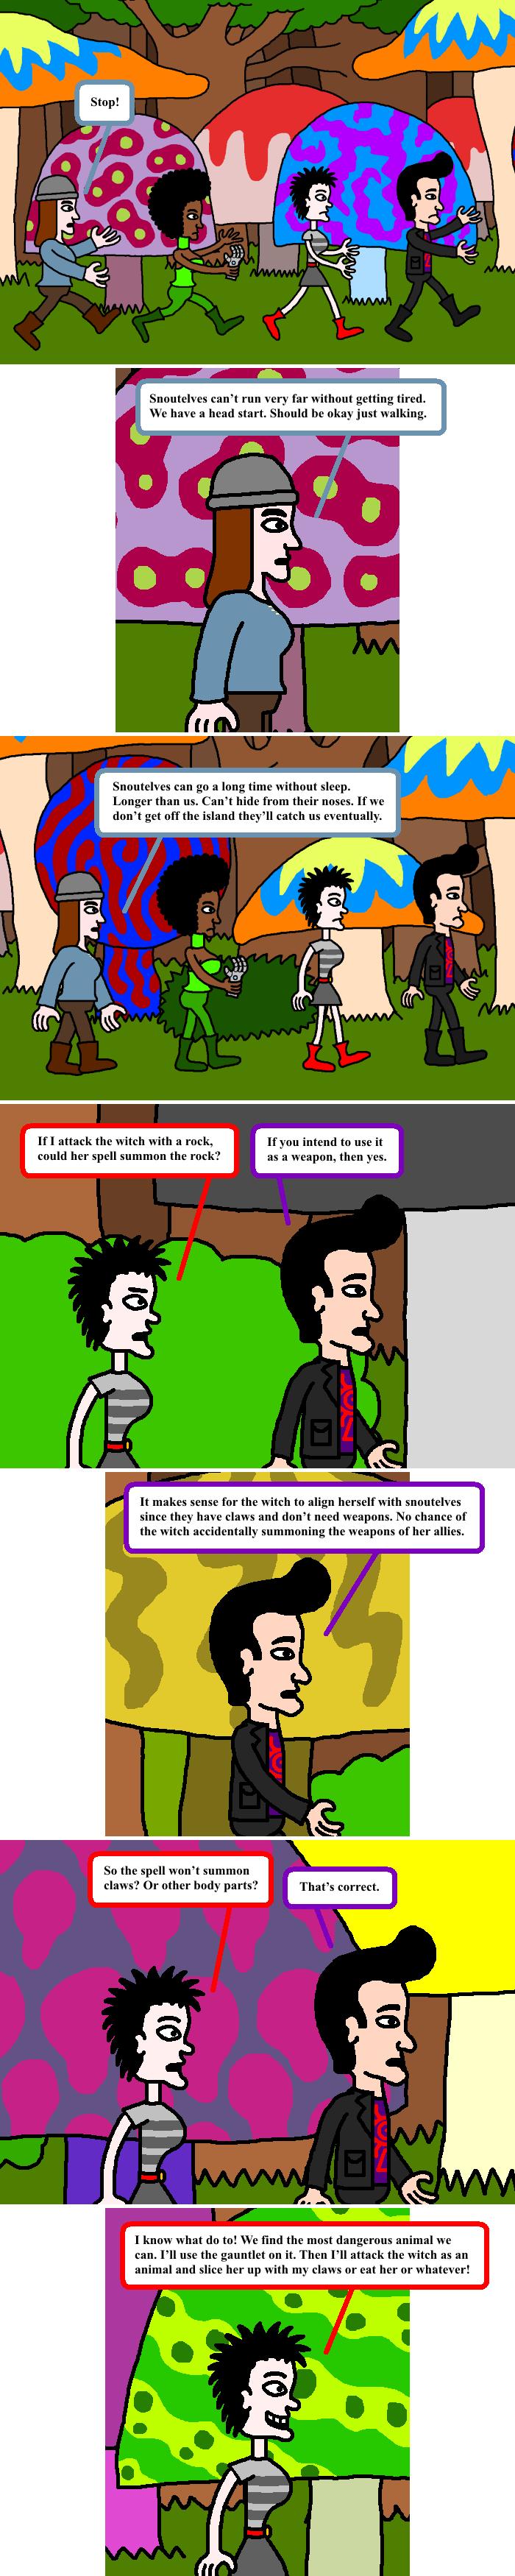 Conundrum of Death 3